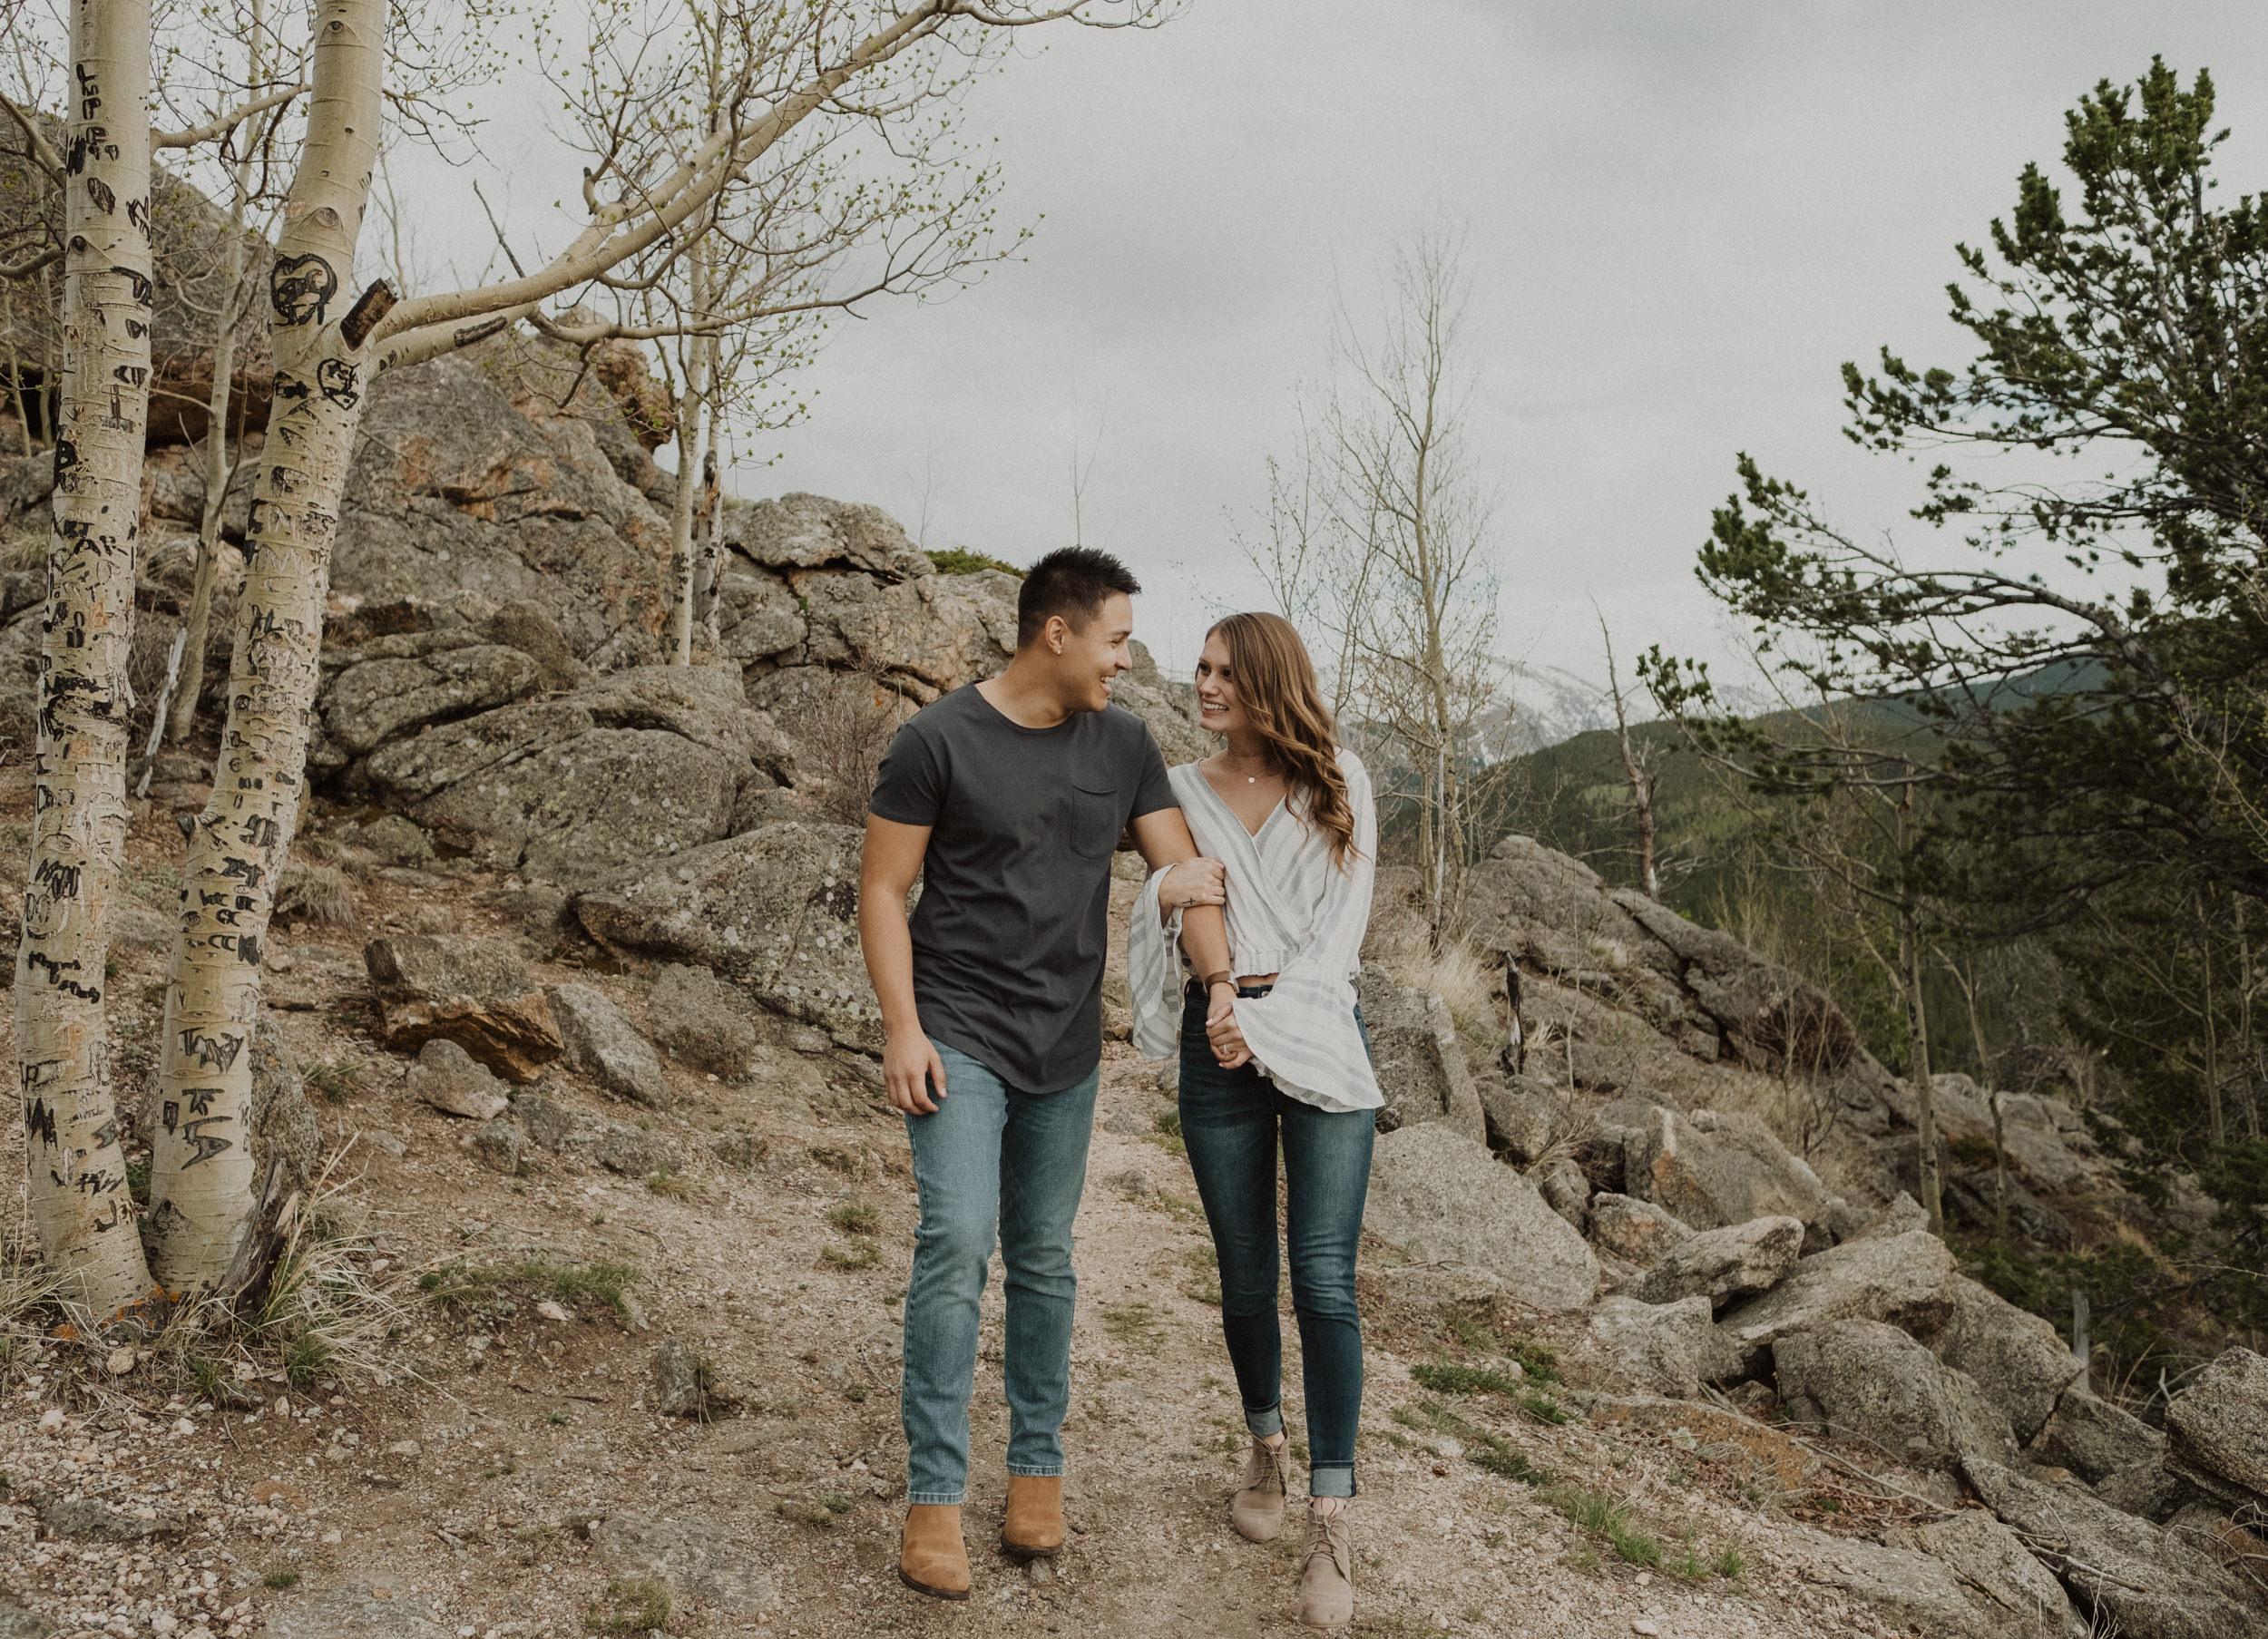 Colorado adventure engagement photos. Colorado elopement and wedding photographer. Mt. Evans mountain engagement session